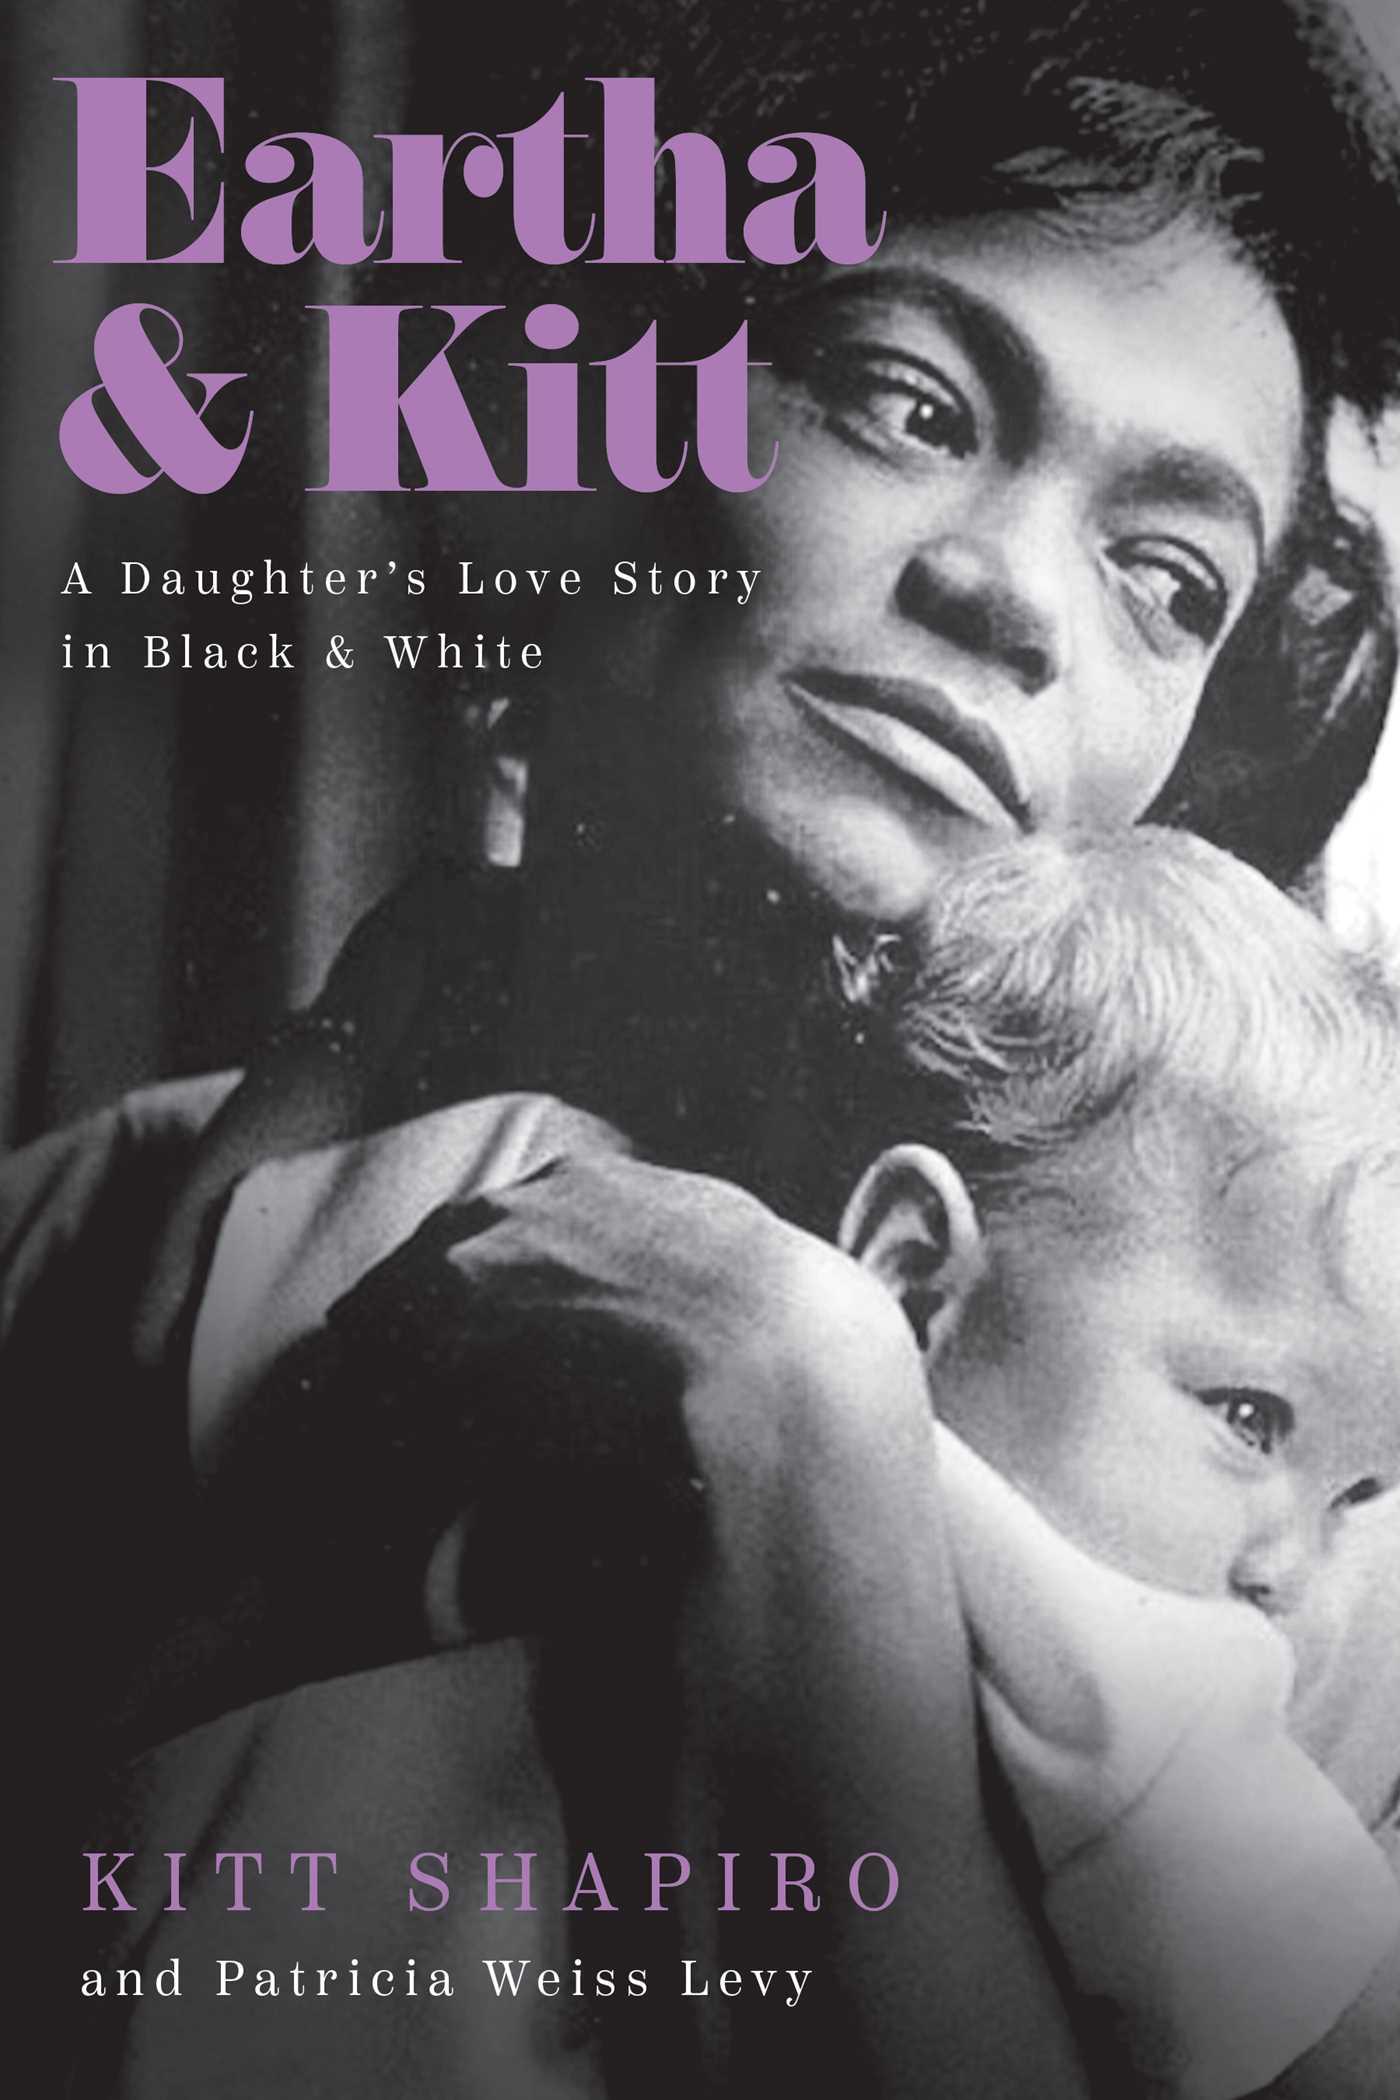 Eartha  Kitt: A Daughter's Love Story in Black and White